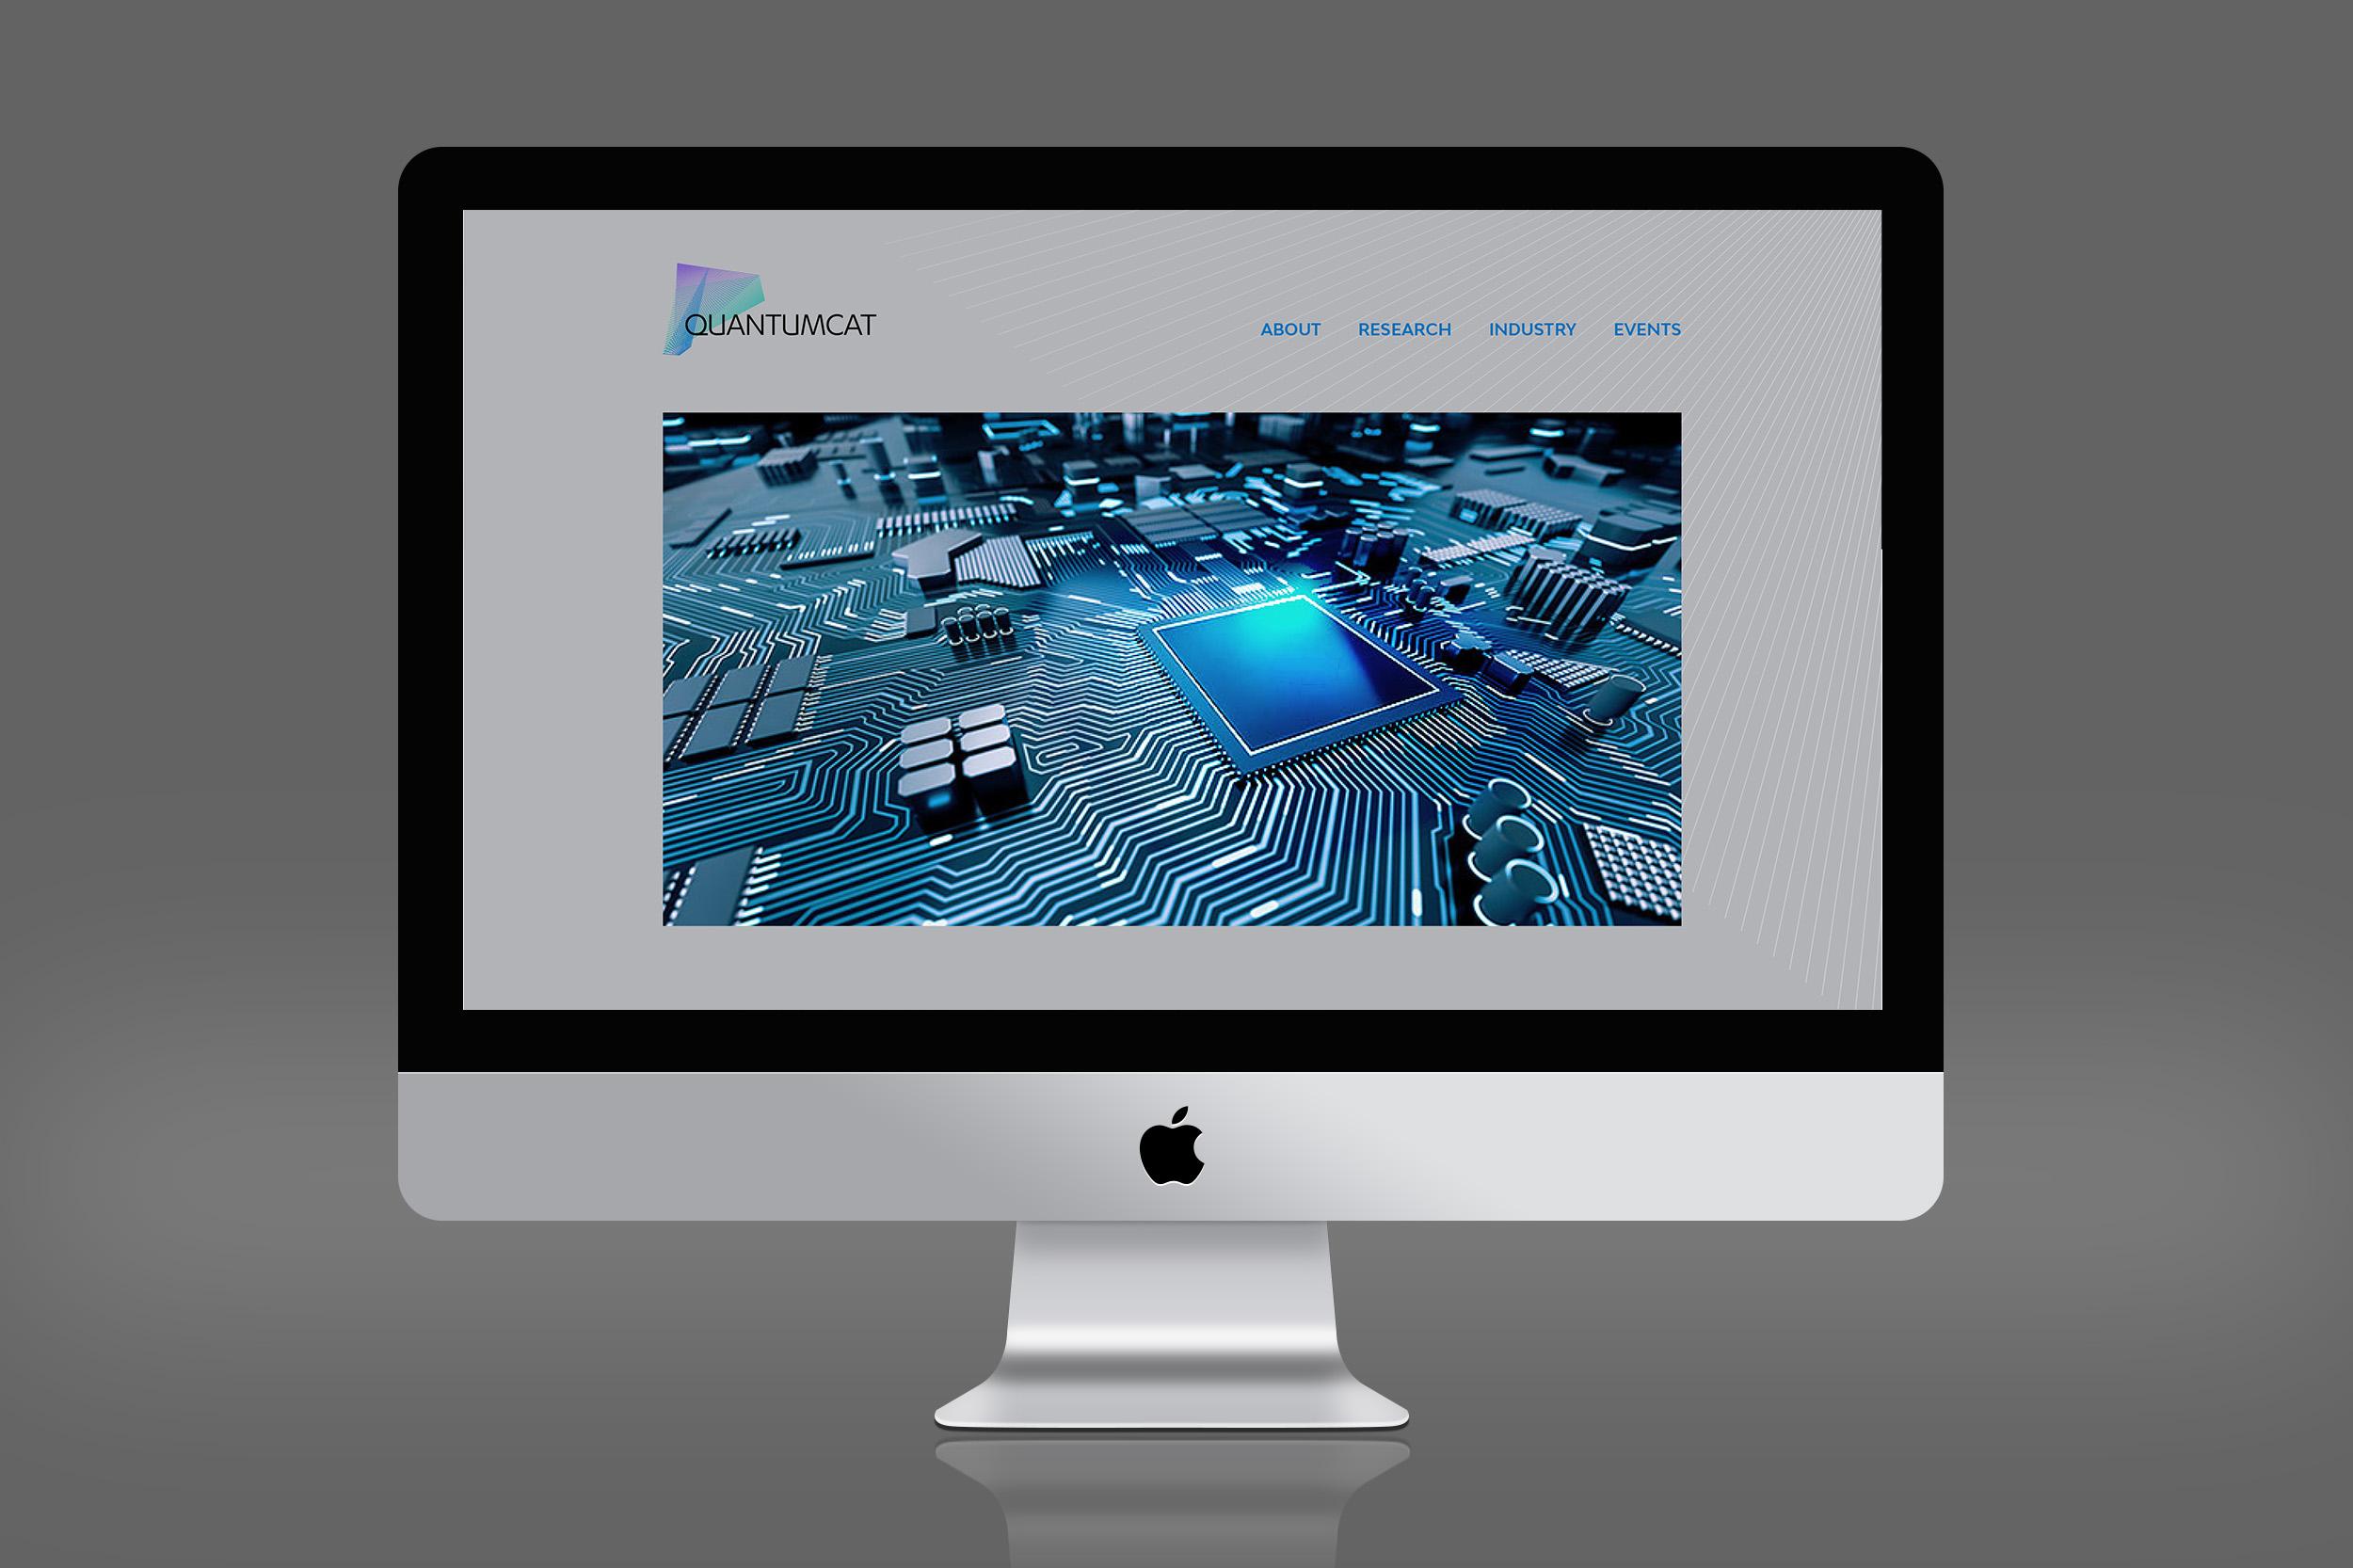 Bitflow-studio-quantumcat-identity-design-logo-research-network-10